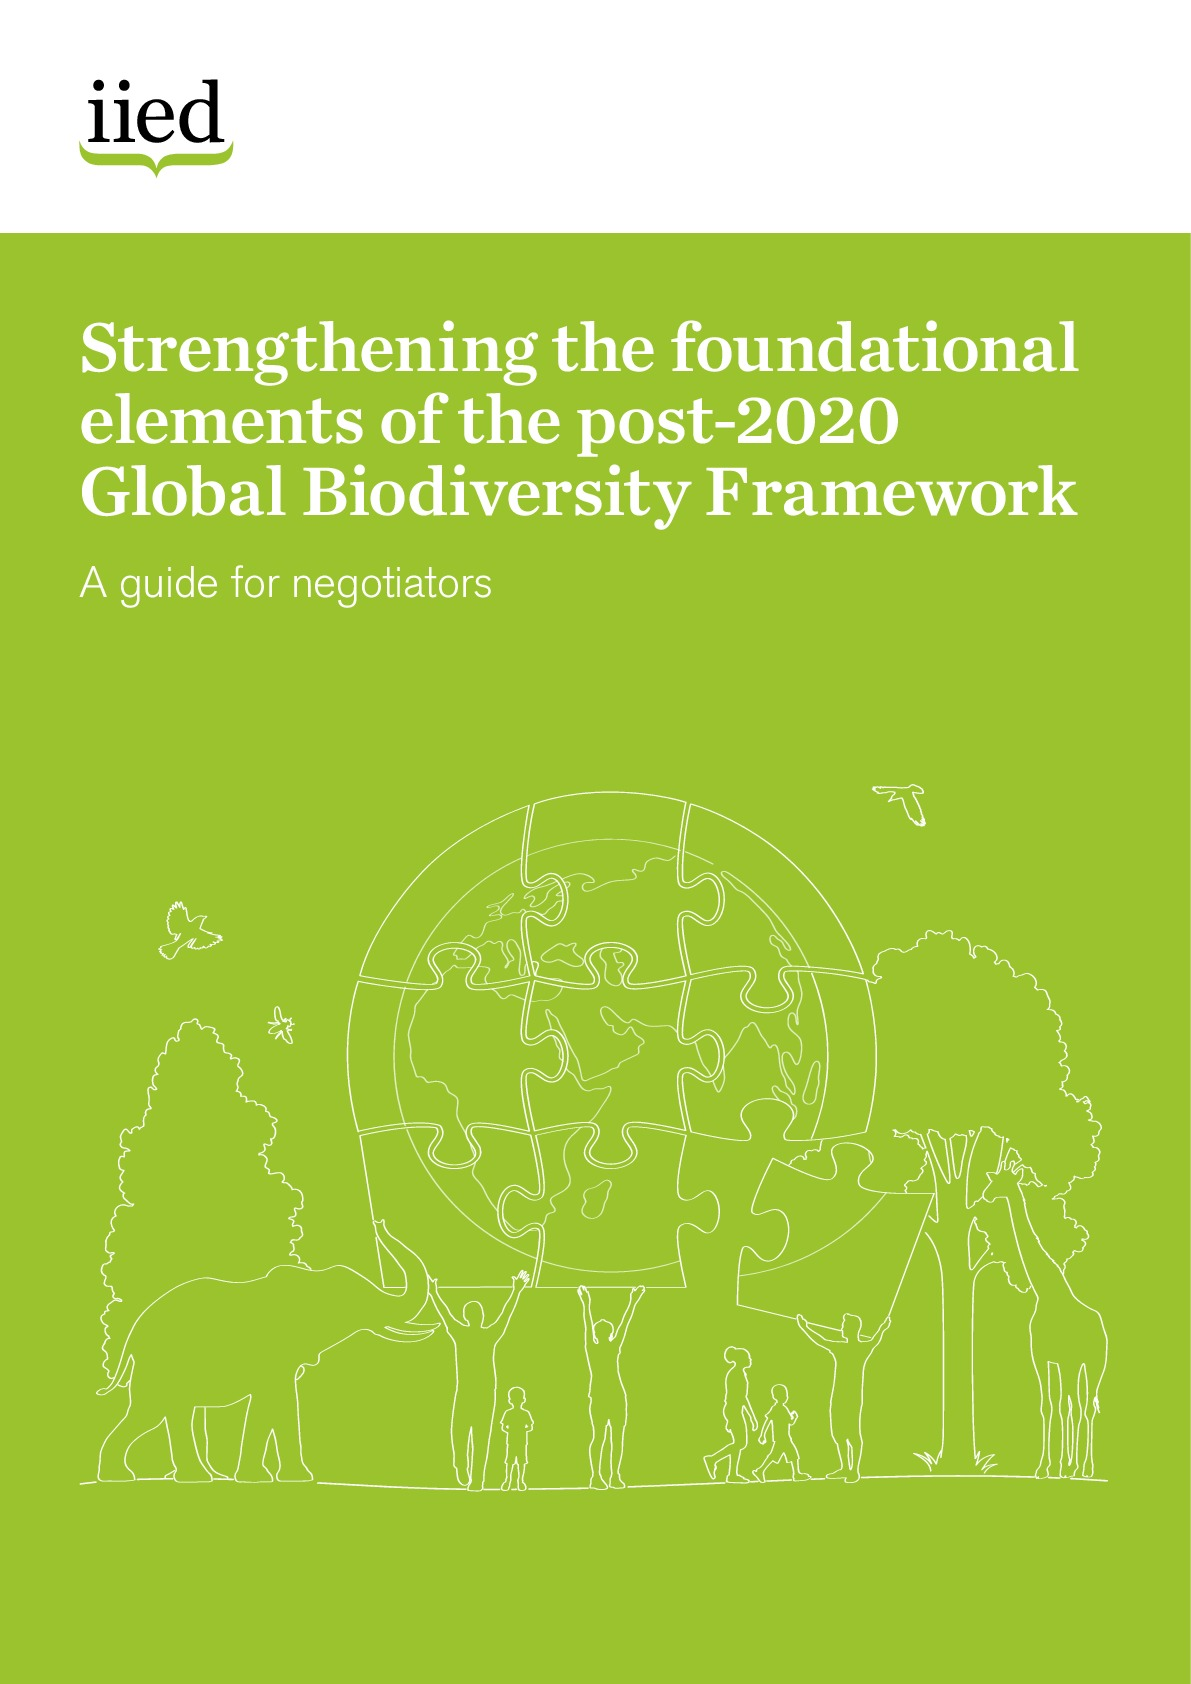 Strengthening the foundational elements of the post-2020 Global Biodiversity Framework